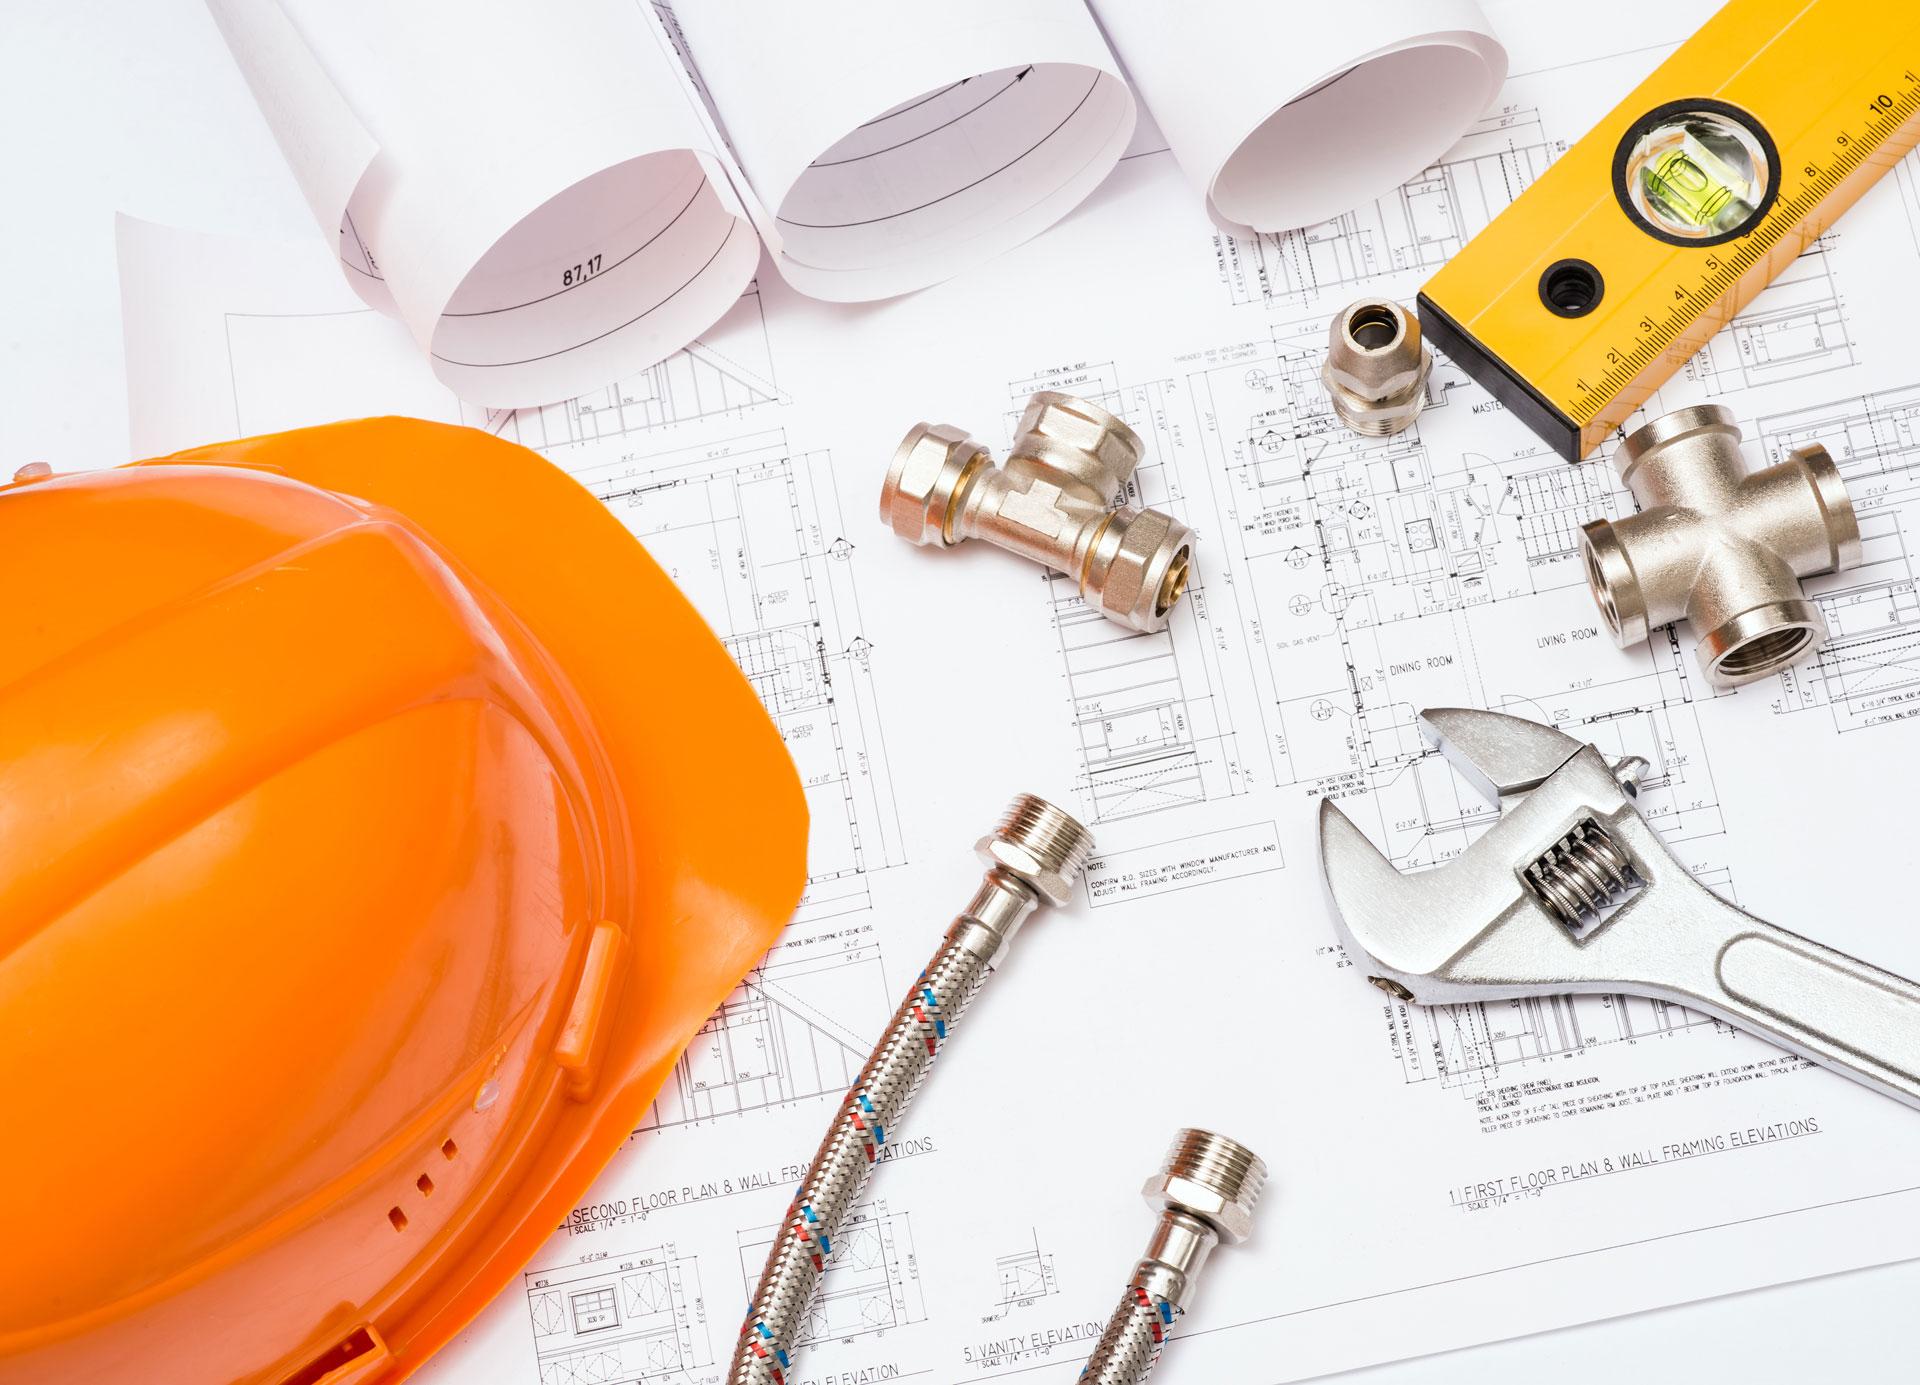 Impianti idraulici | Manutenzione Impianti idraulici | Realizzazione Impianti idraulici | Rifacimento Impianti idraulici | Impresa edile Roma | C.E.BU.